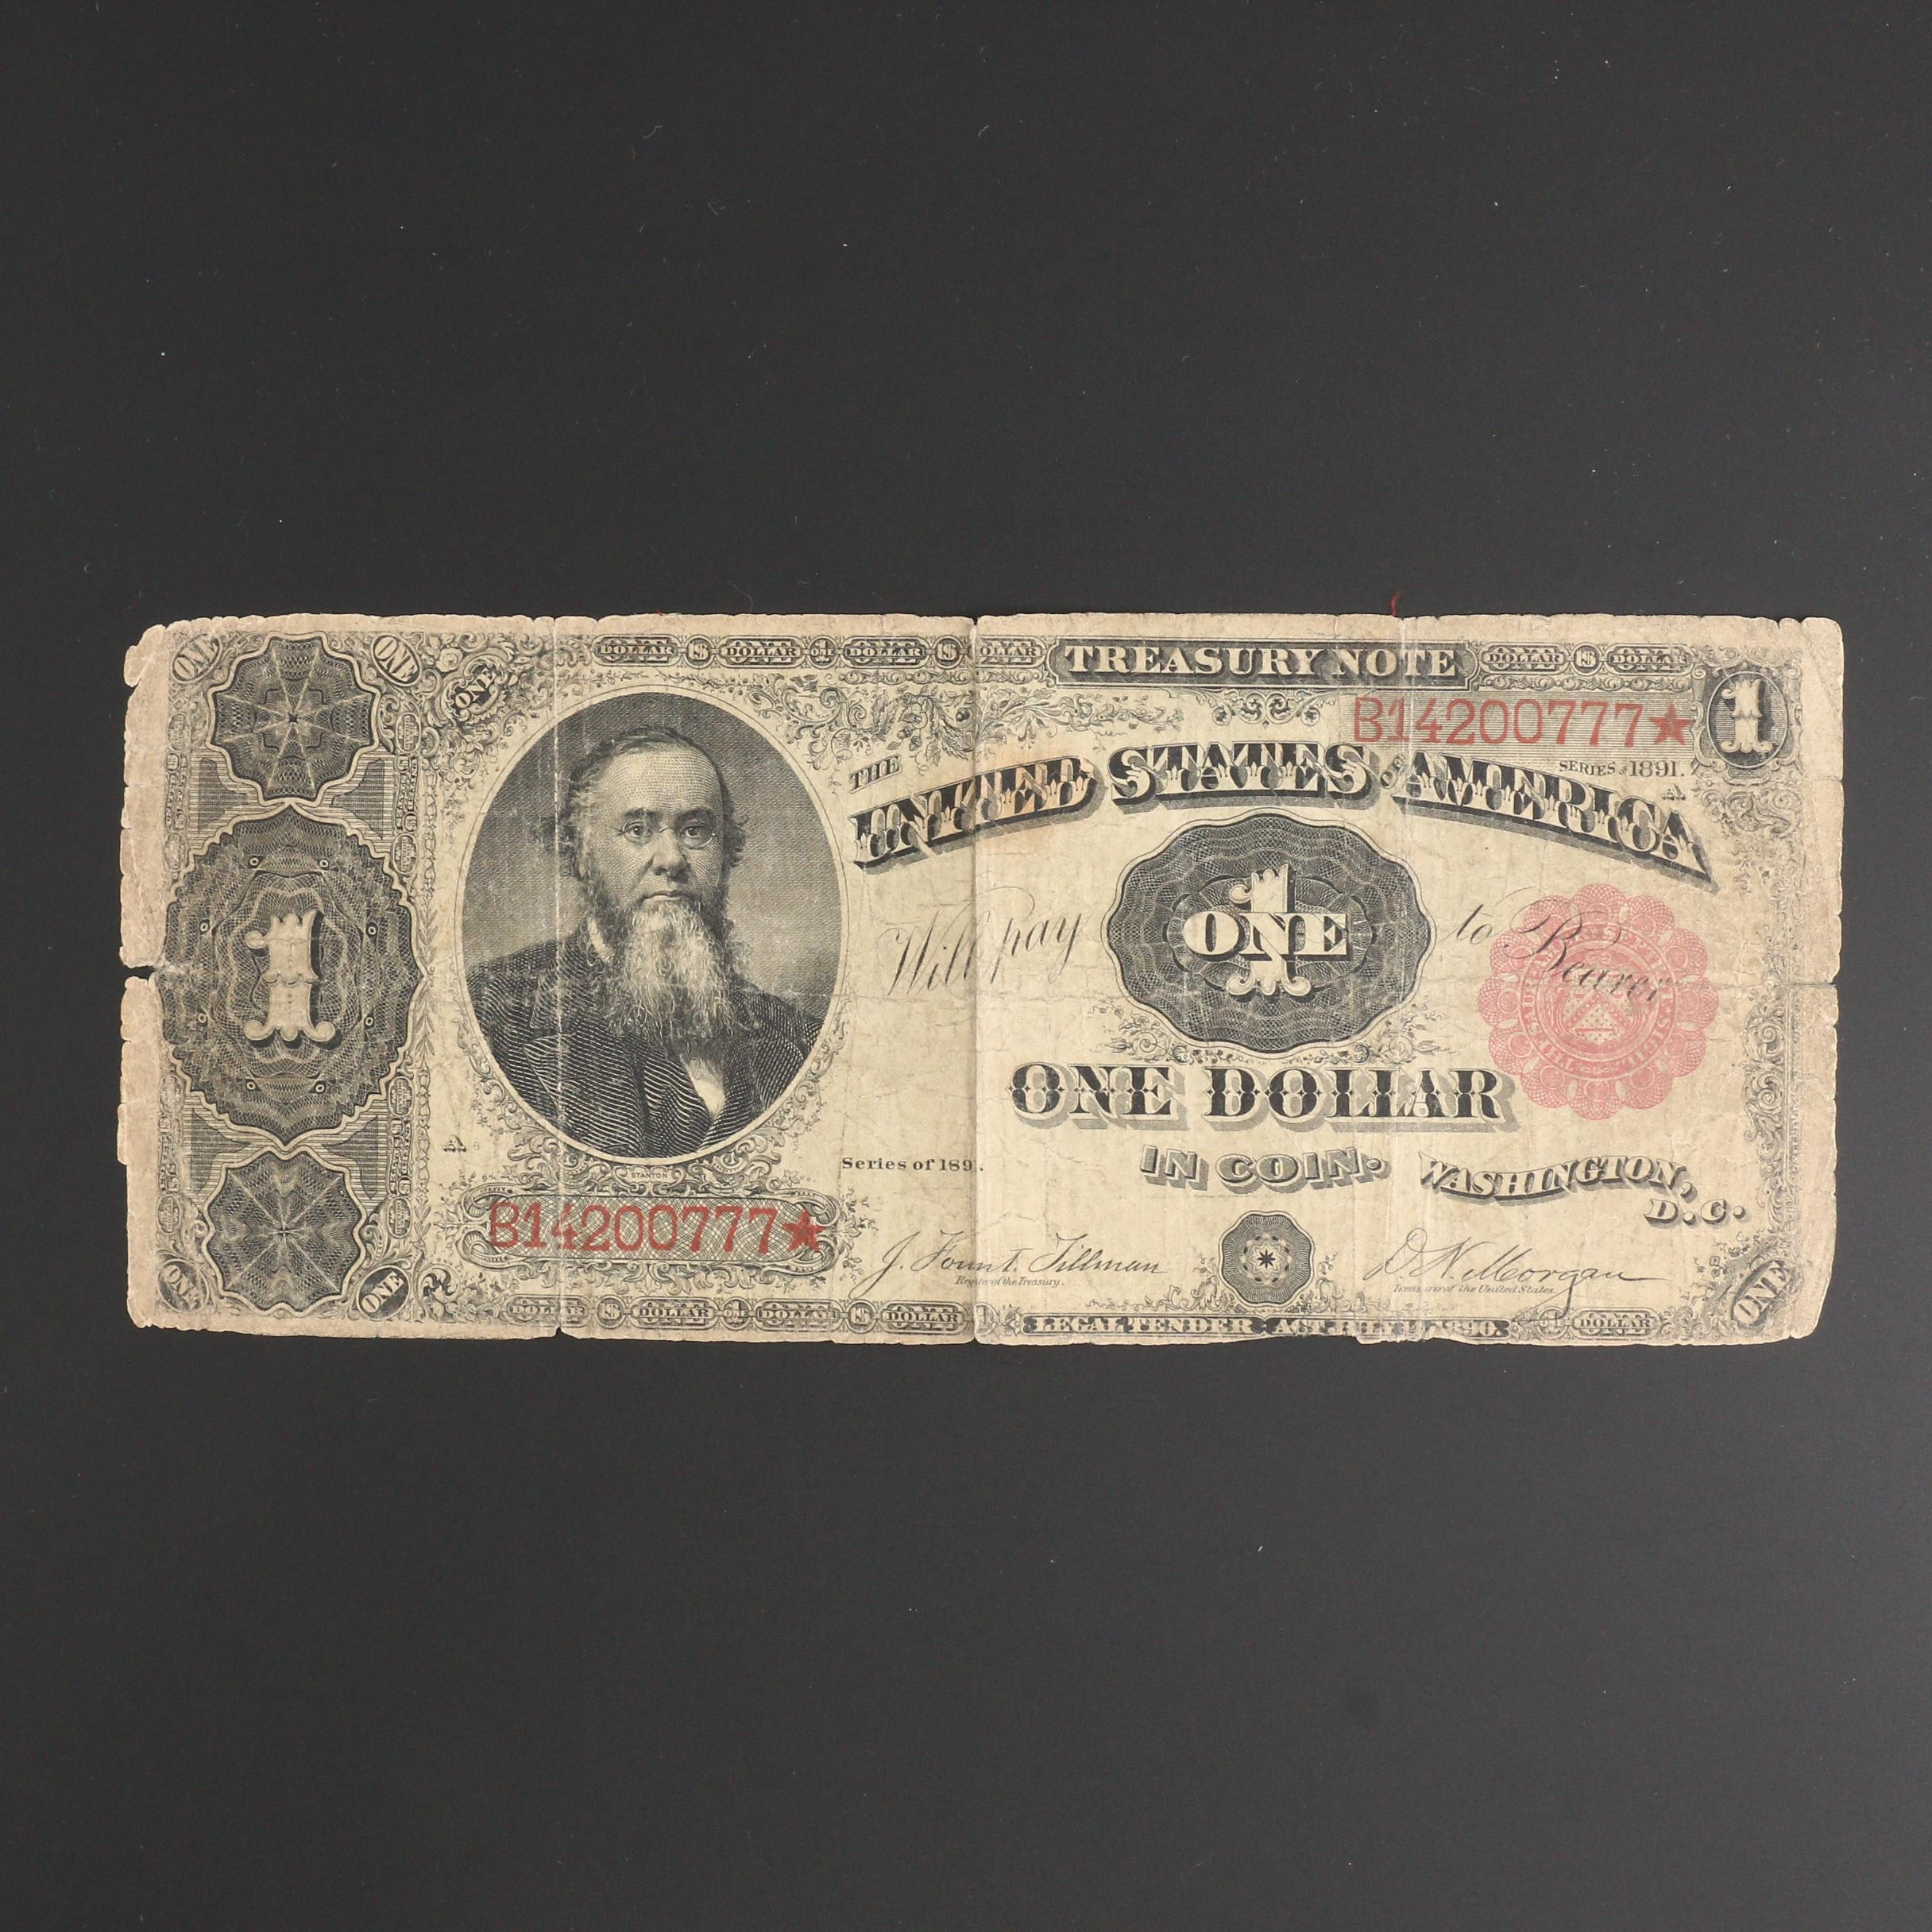 Series of 1891 $1 U.S. Treasury Note